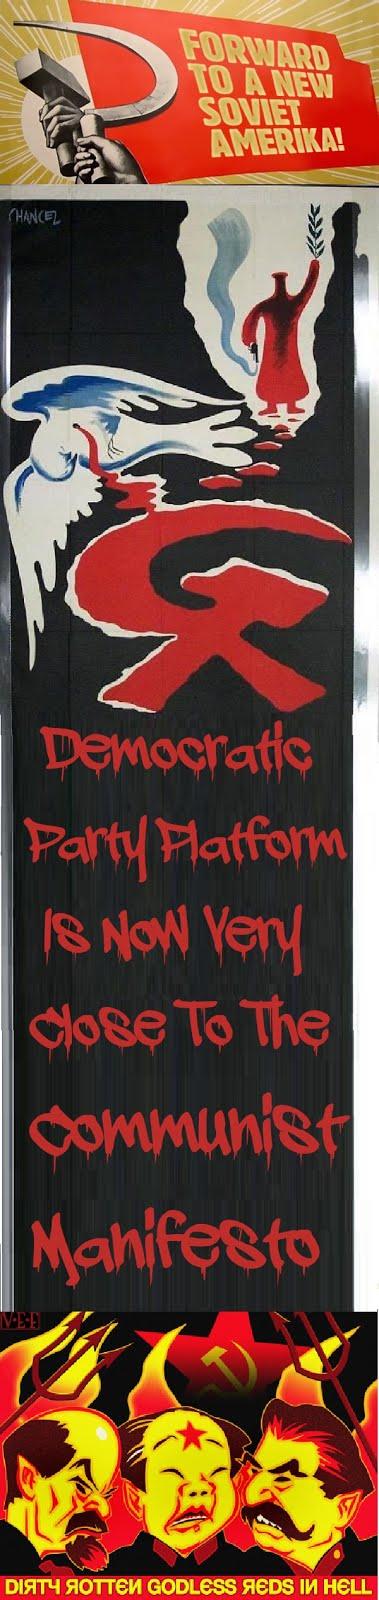 DNC Platform or Communist Manifesto?